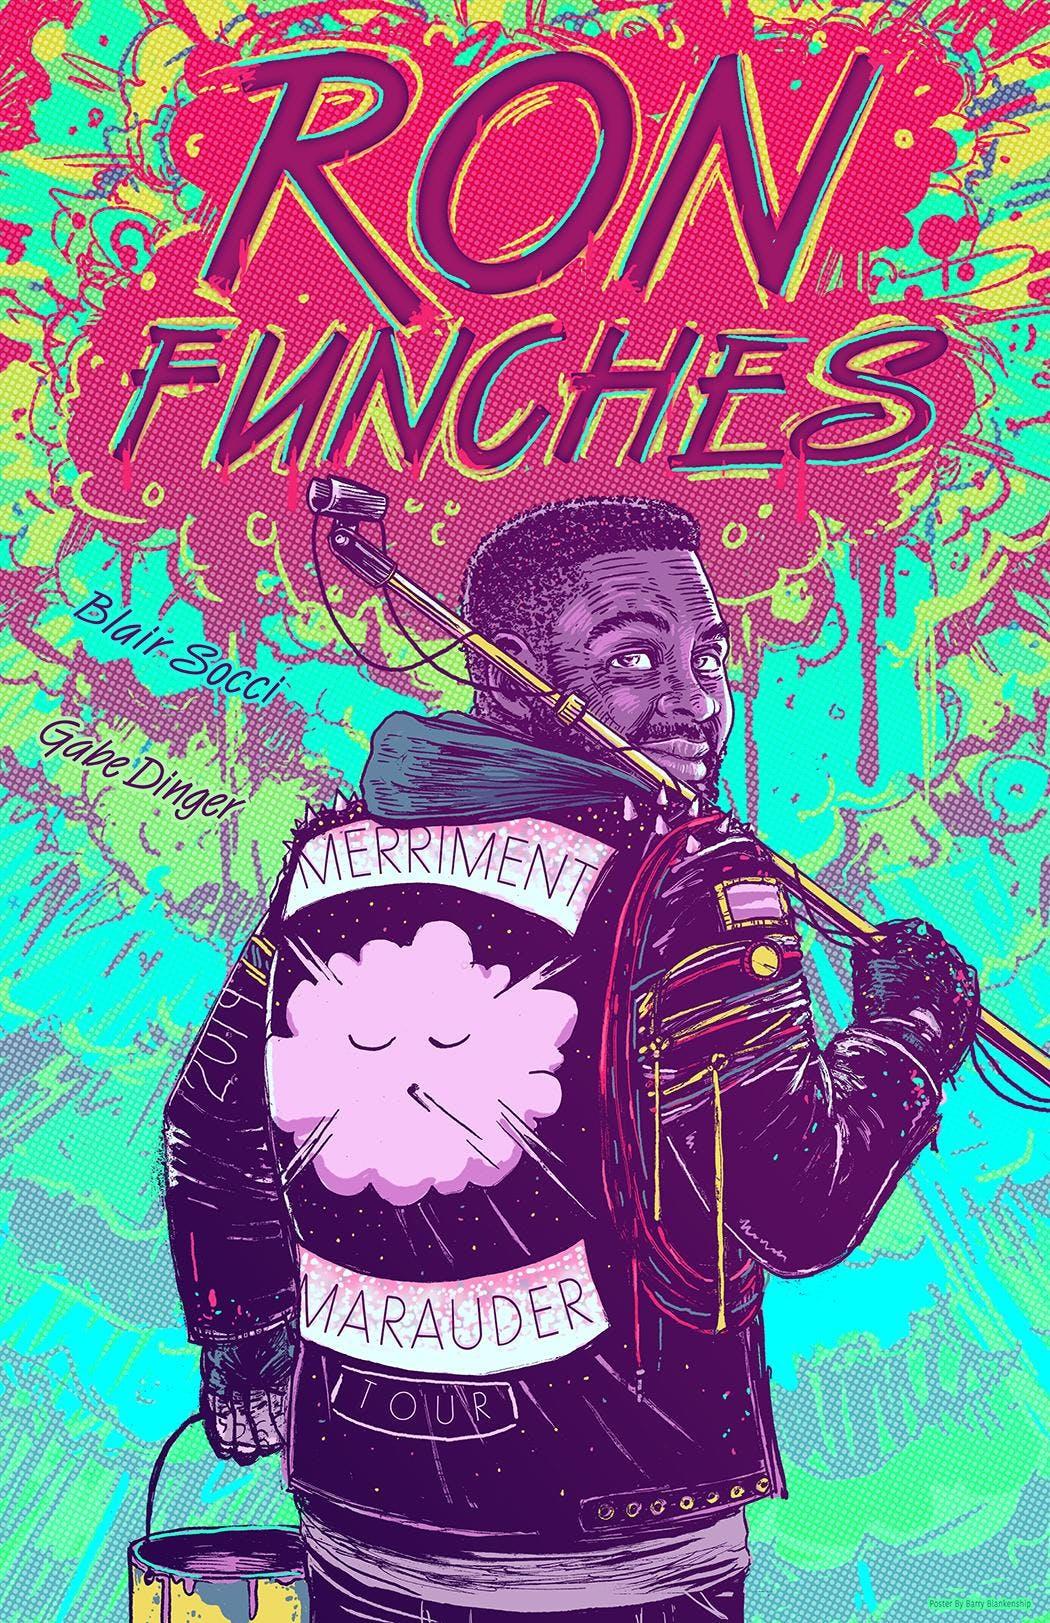 Ron Funches' Merriment Marauder Tour